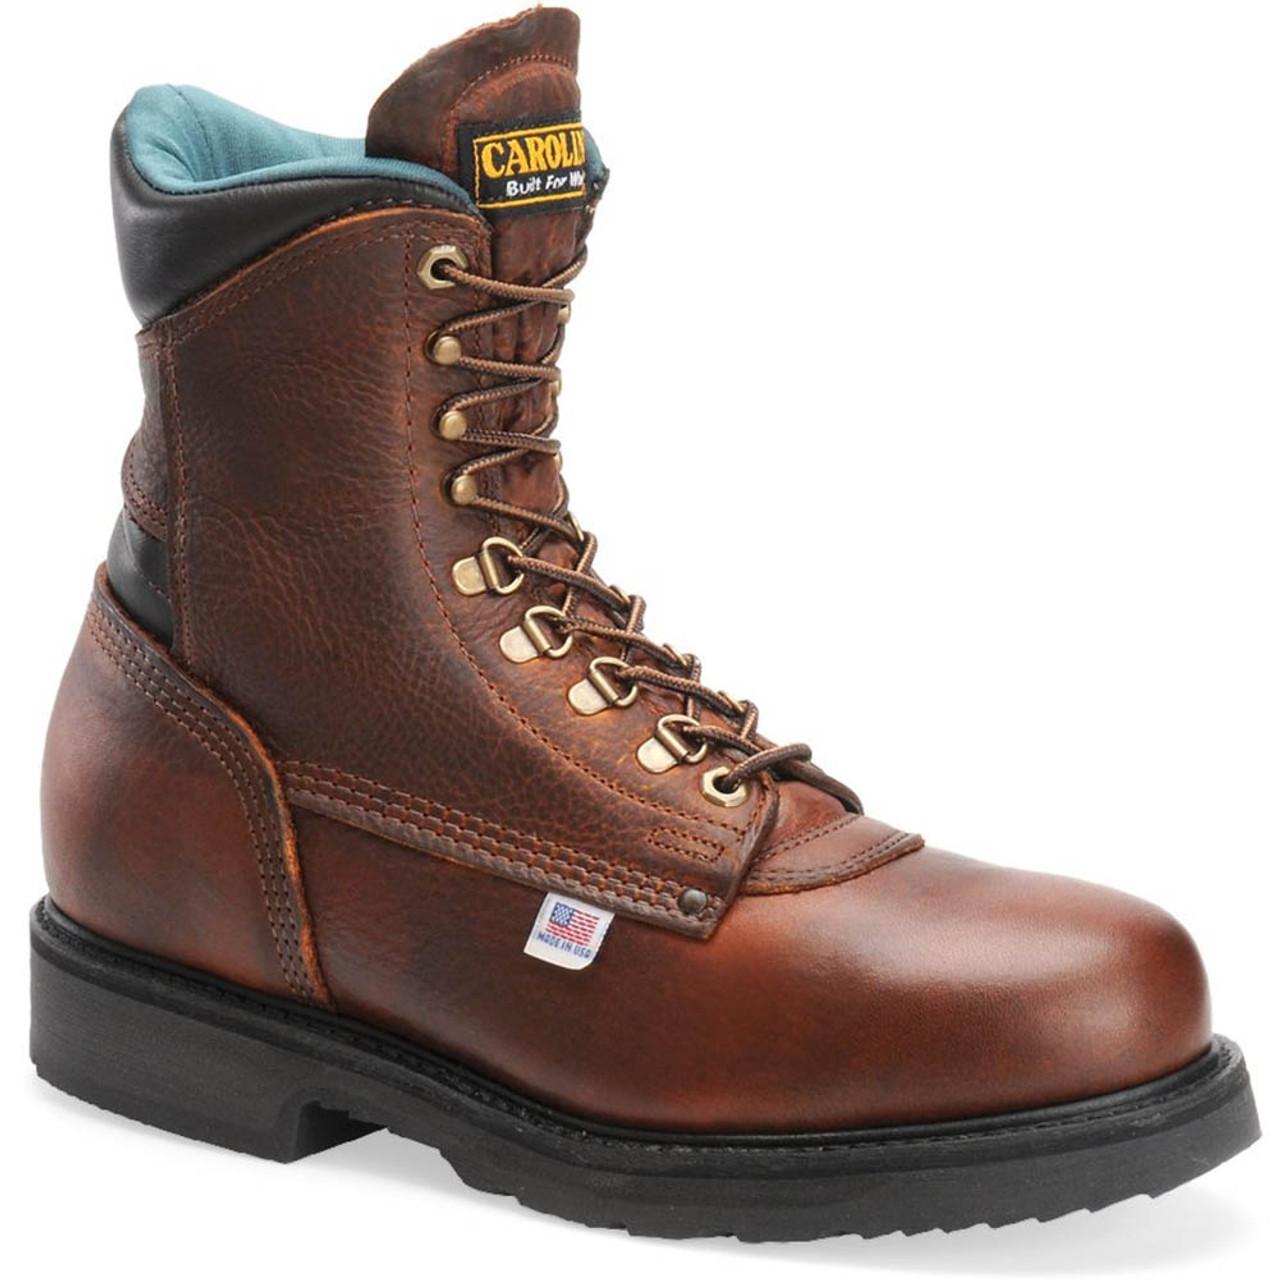 Carolina 1809 USA SARGE HI Steel Toe Non-Insulated Work Boots ...